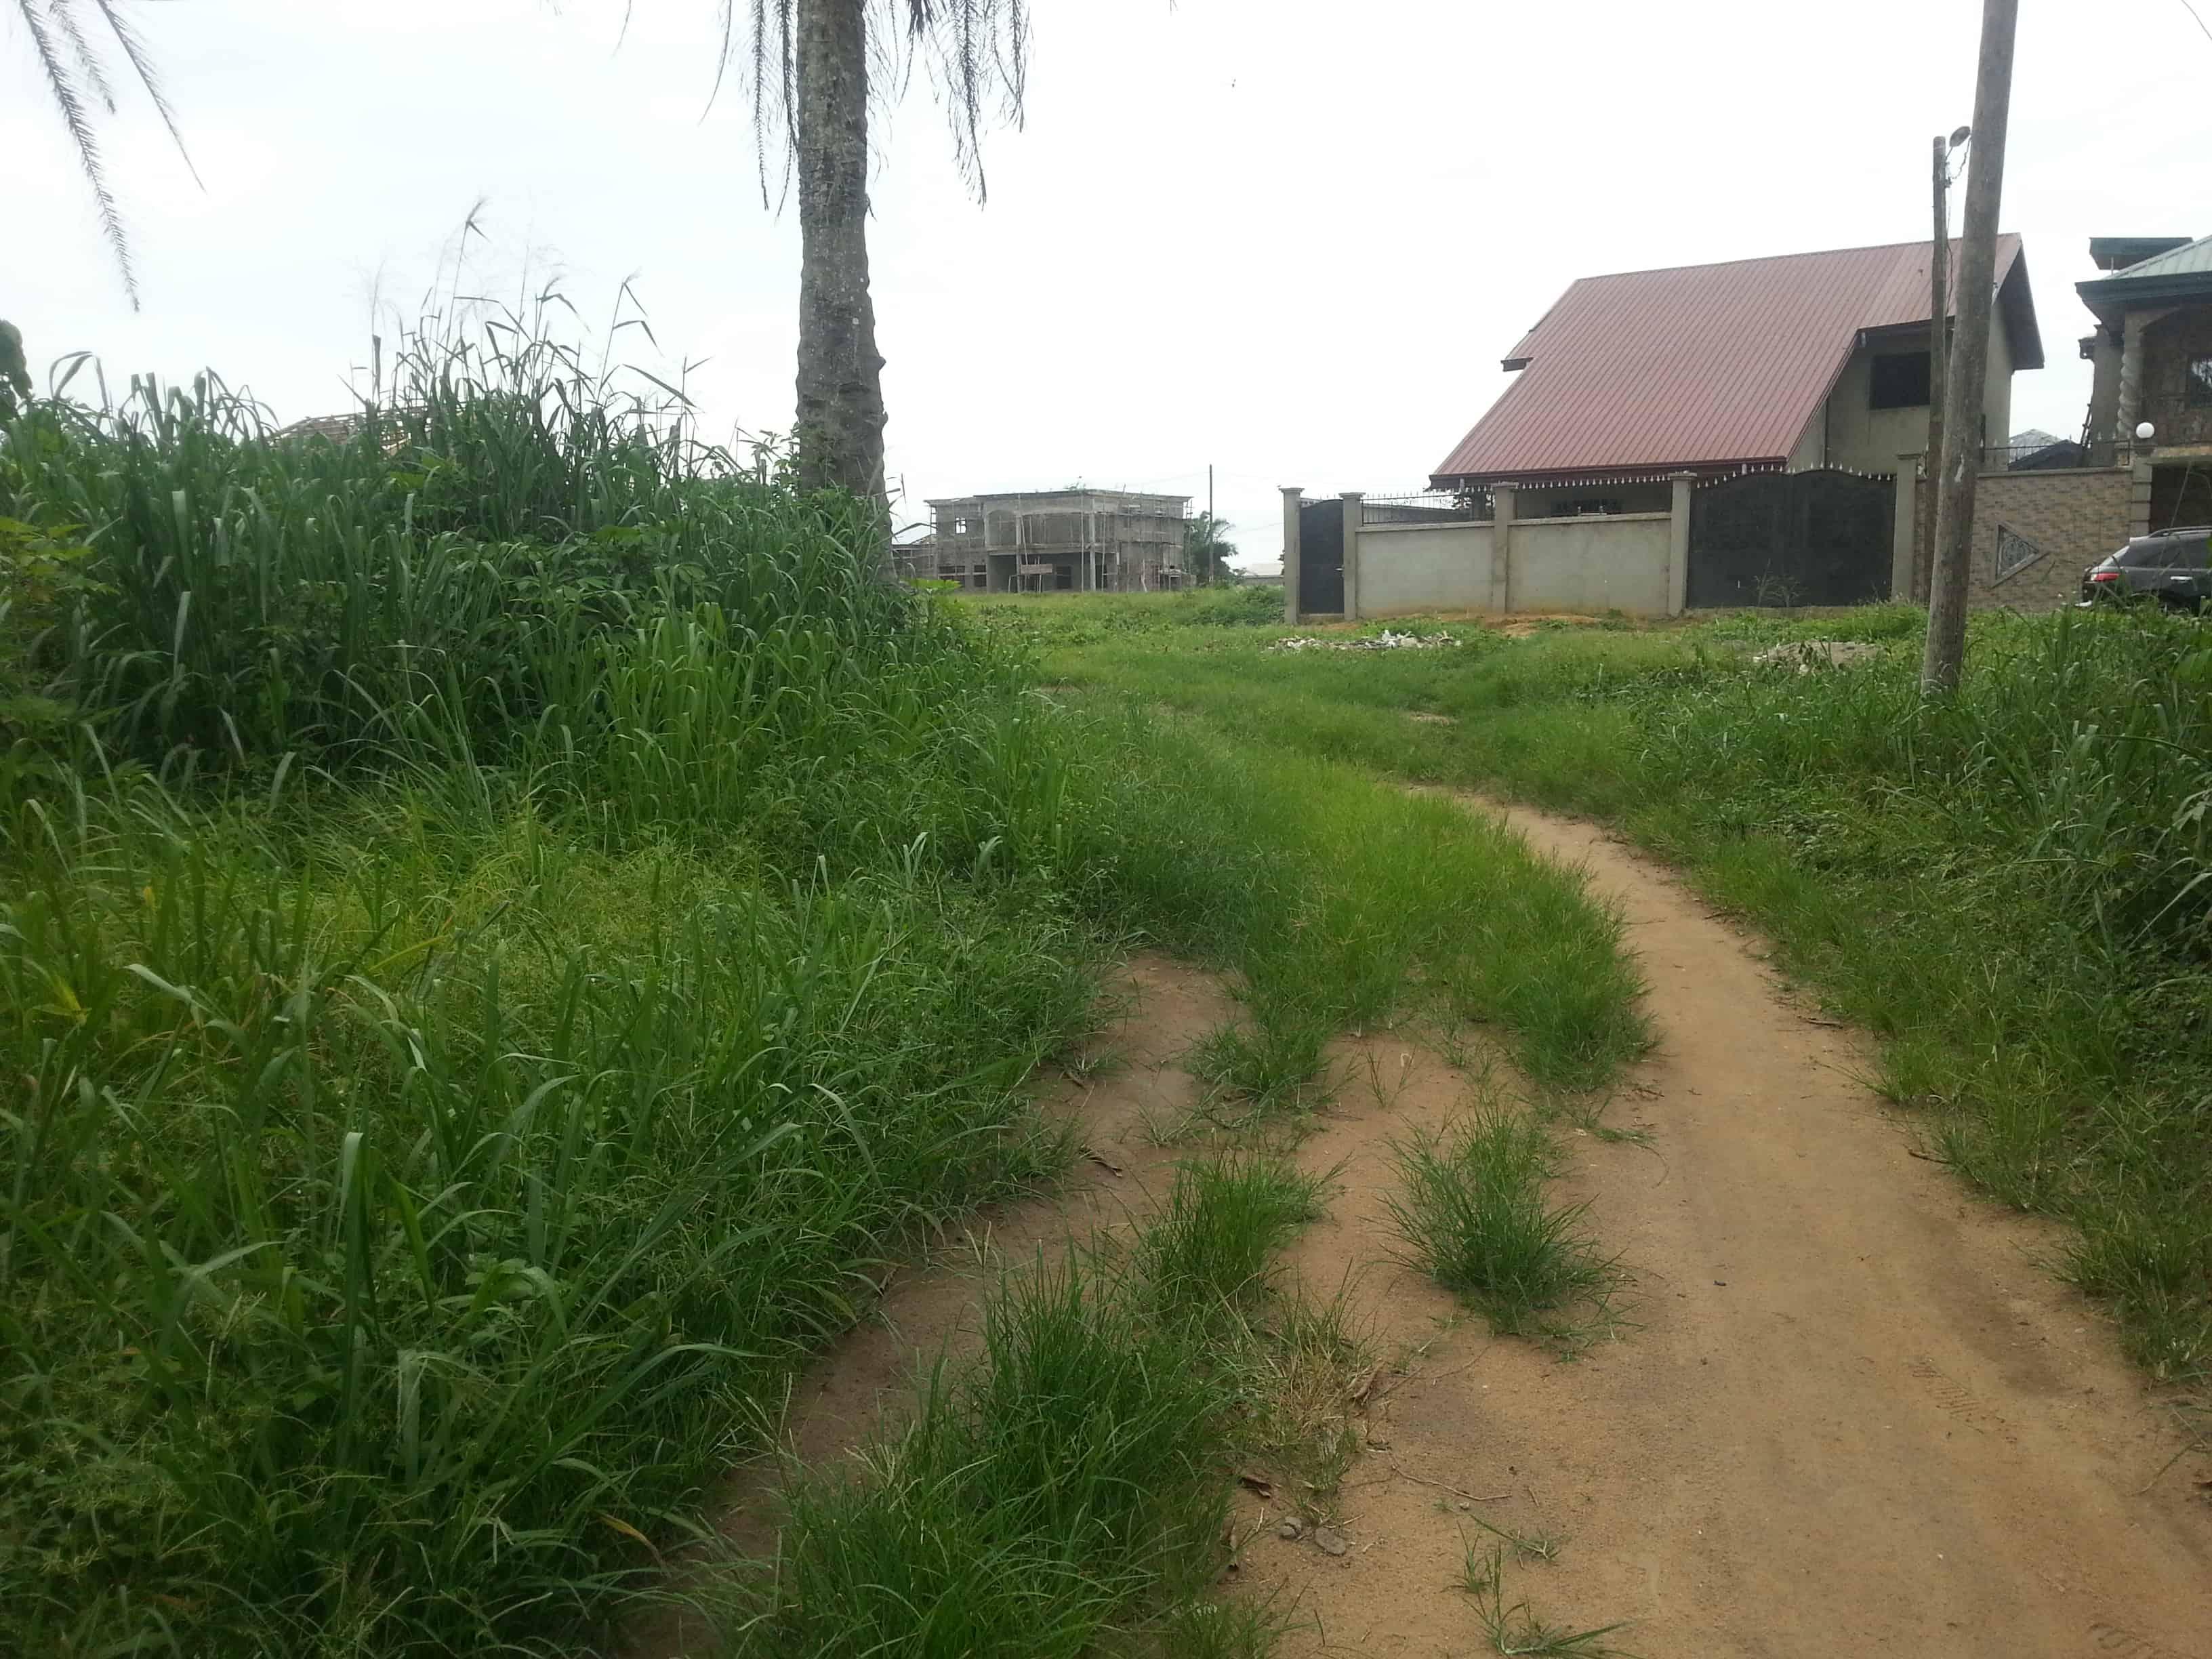 Land for sale at Douala, Japoma, Beach - 1000 m2 - 14 000 000 FCFA